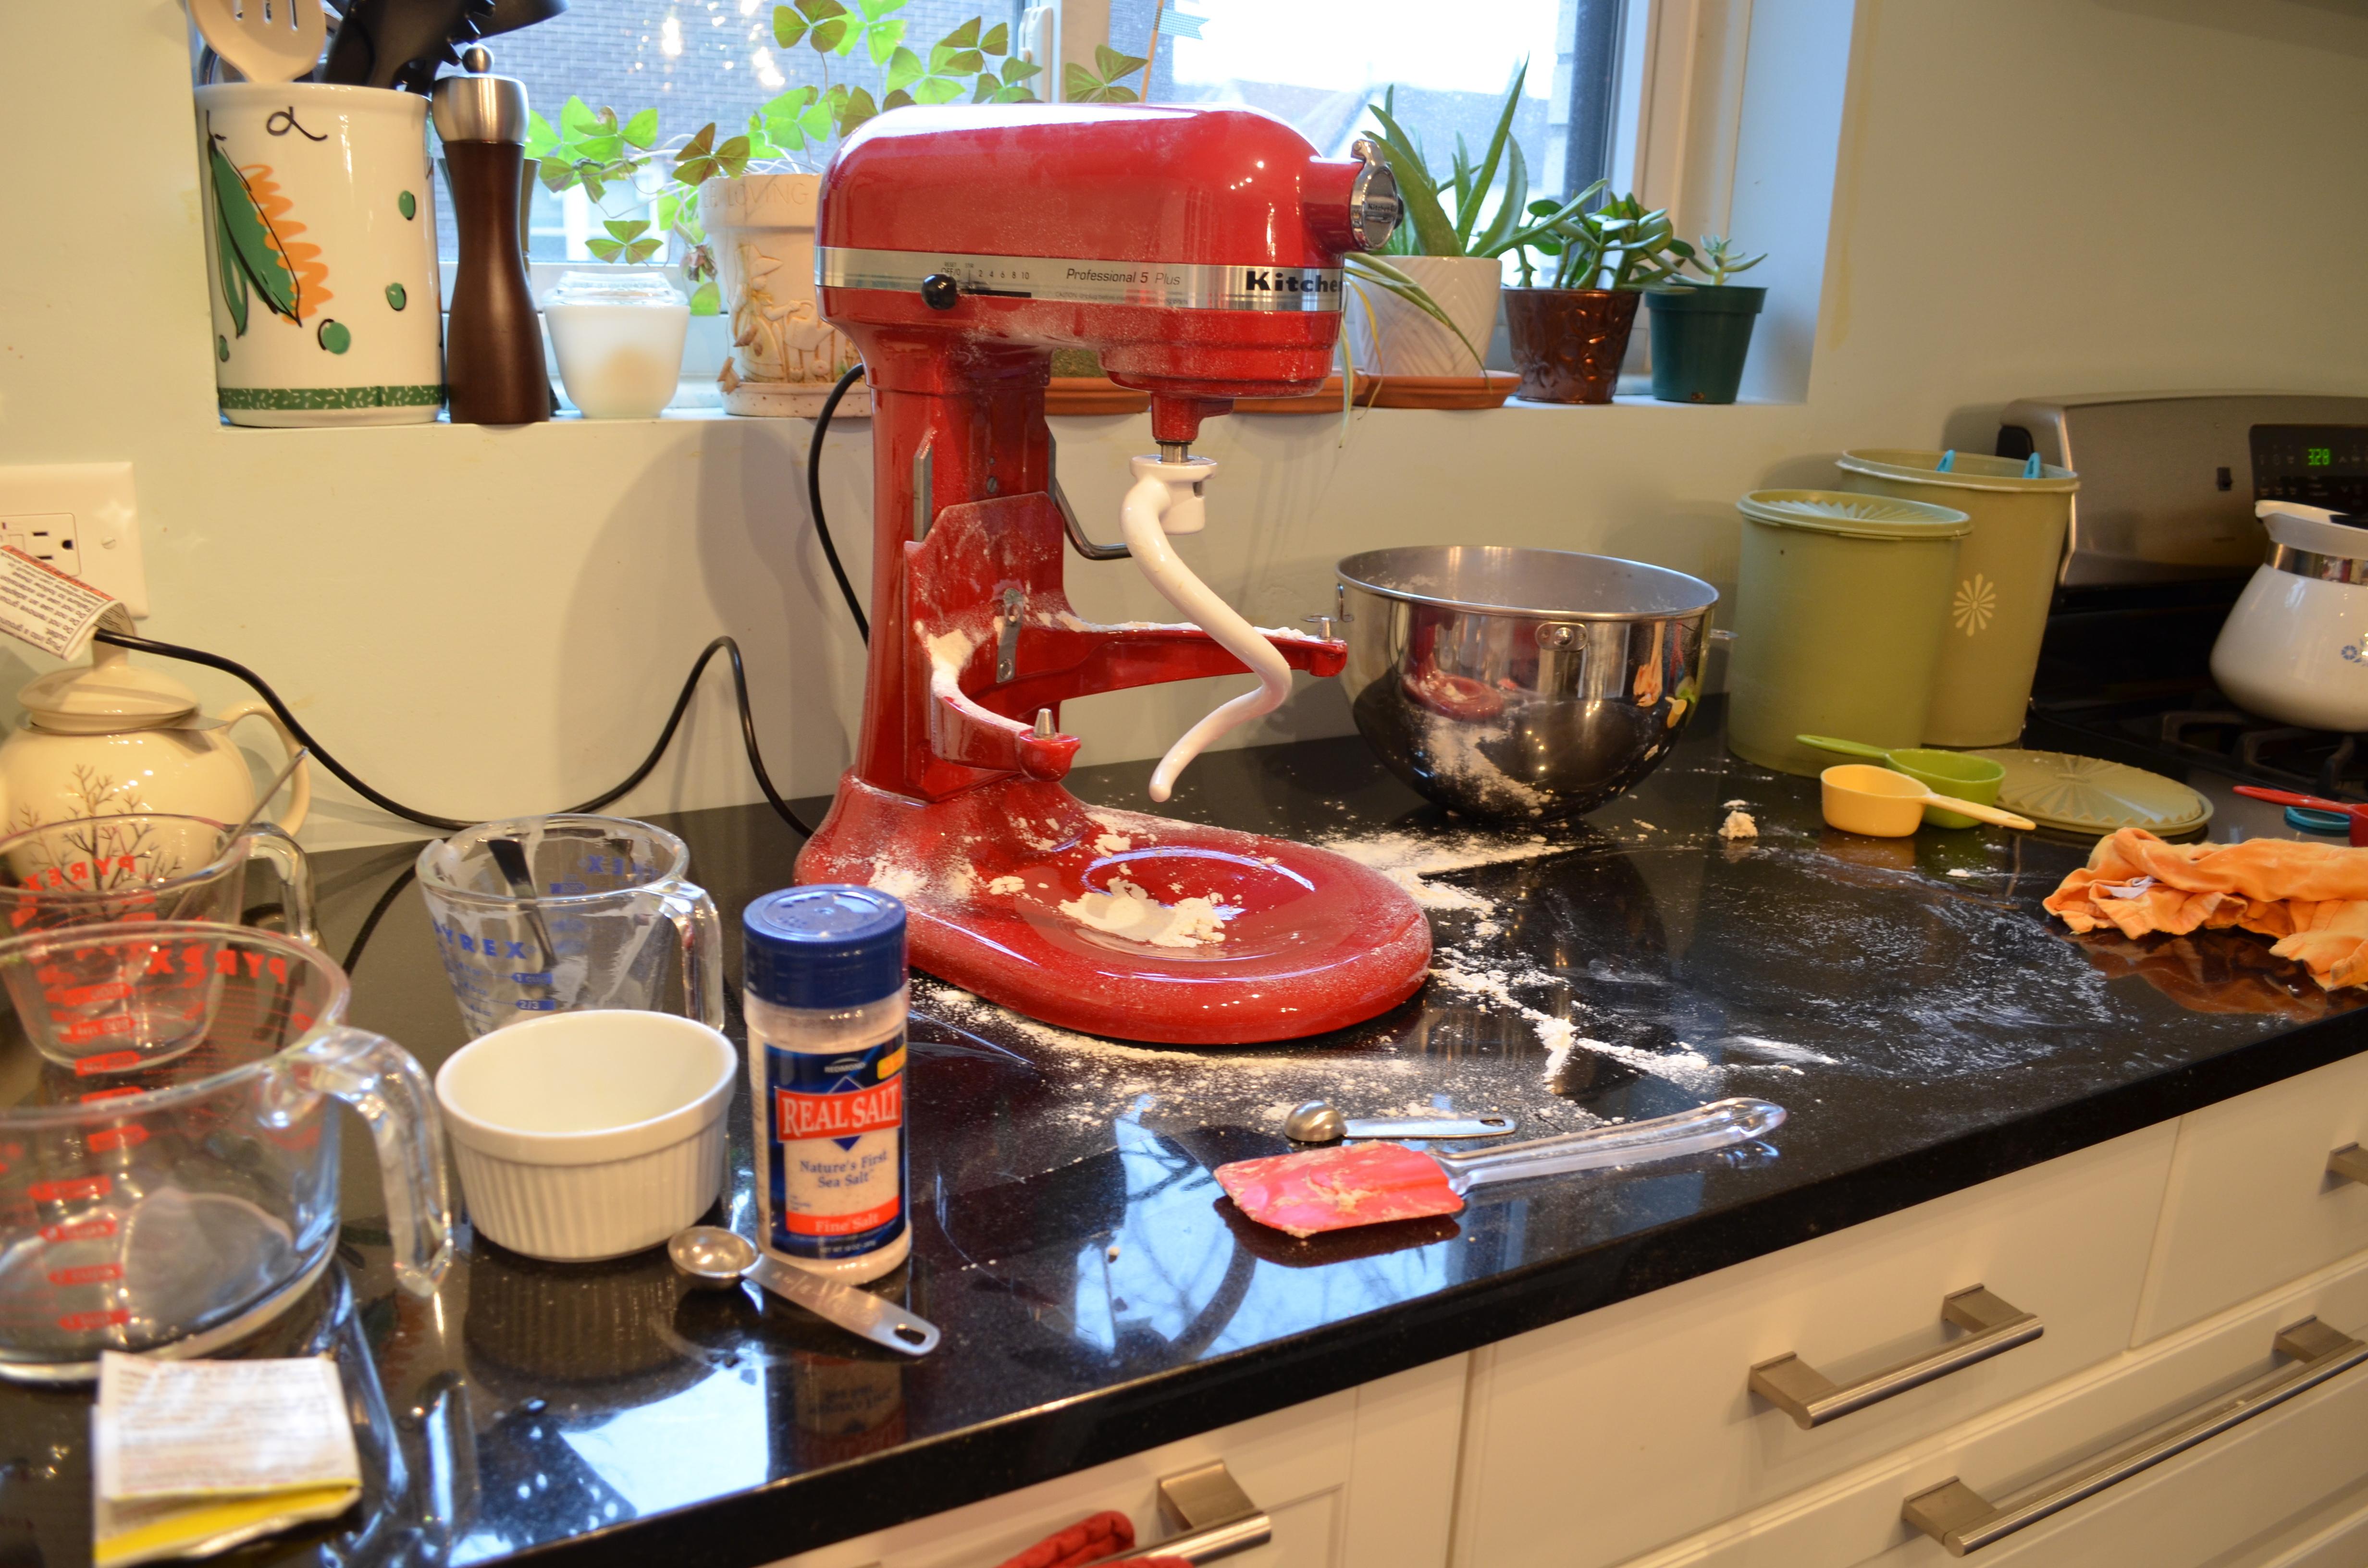 Messy Construction Kitchens : Homemaker s challenge avanti bread kimberly ah